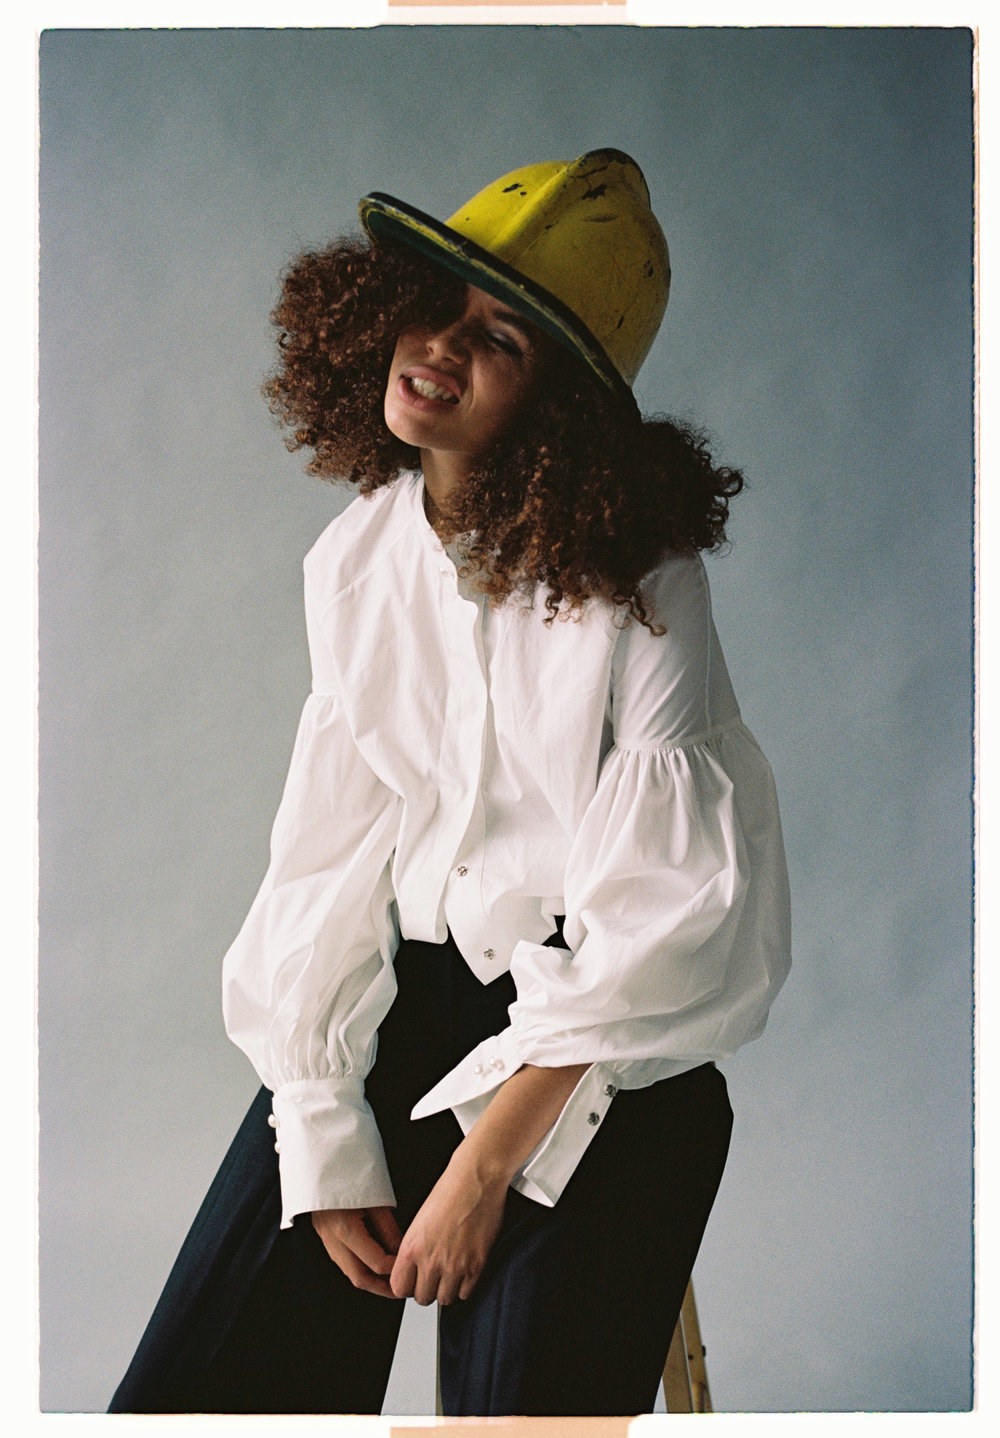 Lulu and yellow helmet.Kodak Portra 160